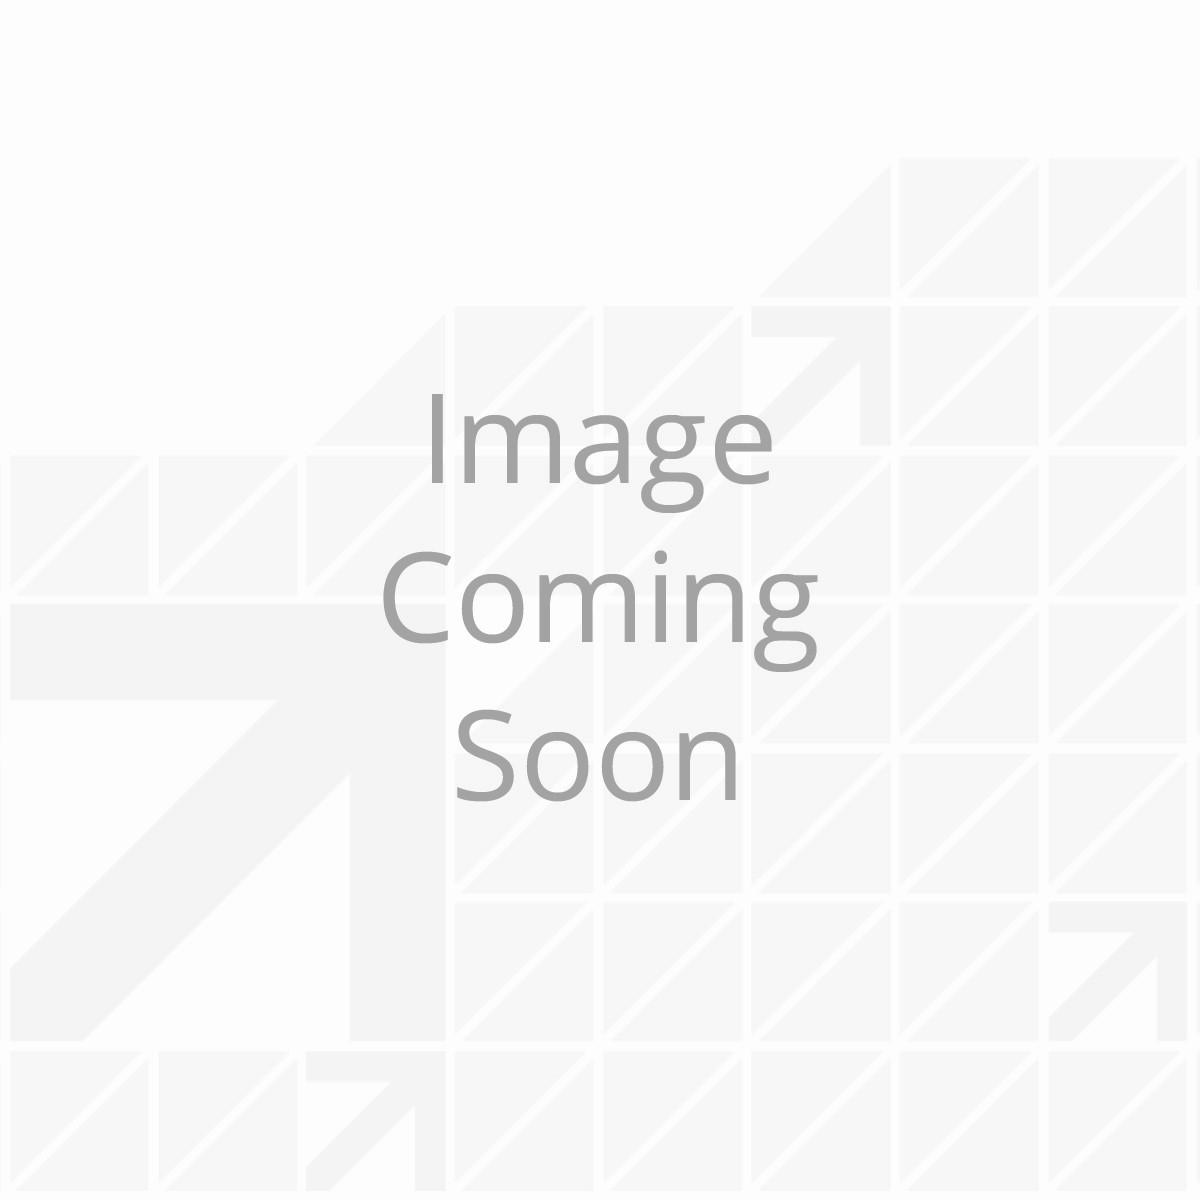 "2-5/16"" A-Frame Coupler with Sleeve-Lock (12,500 lbs, Black)"